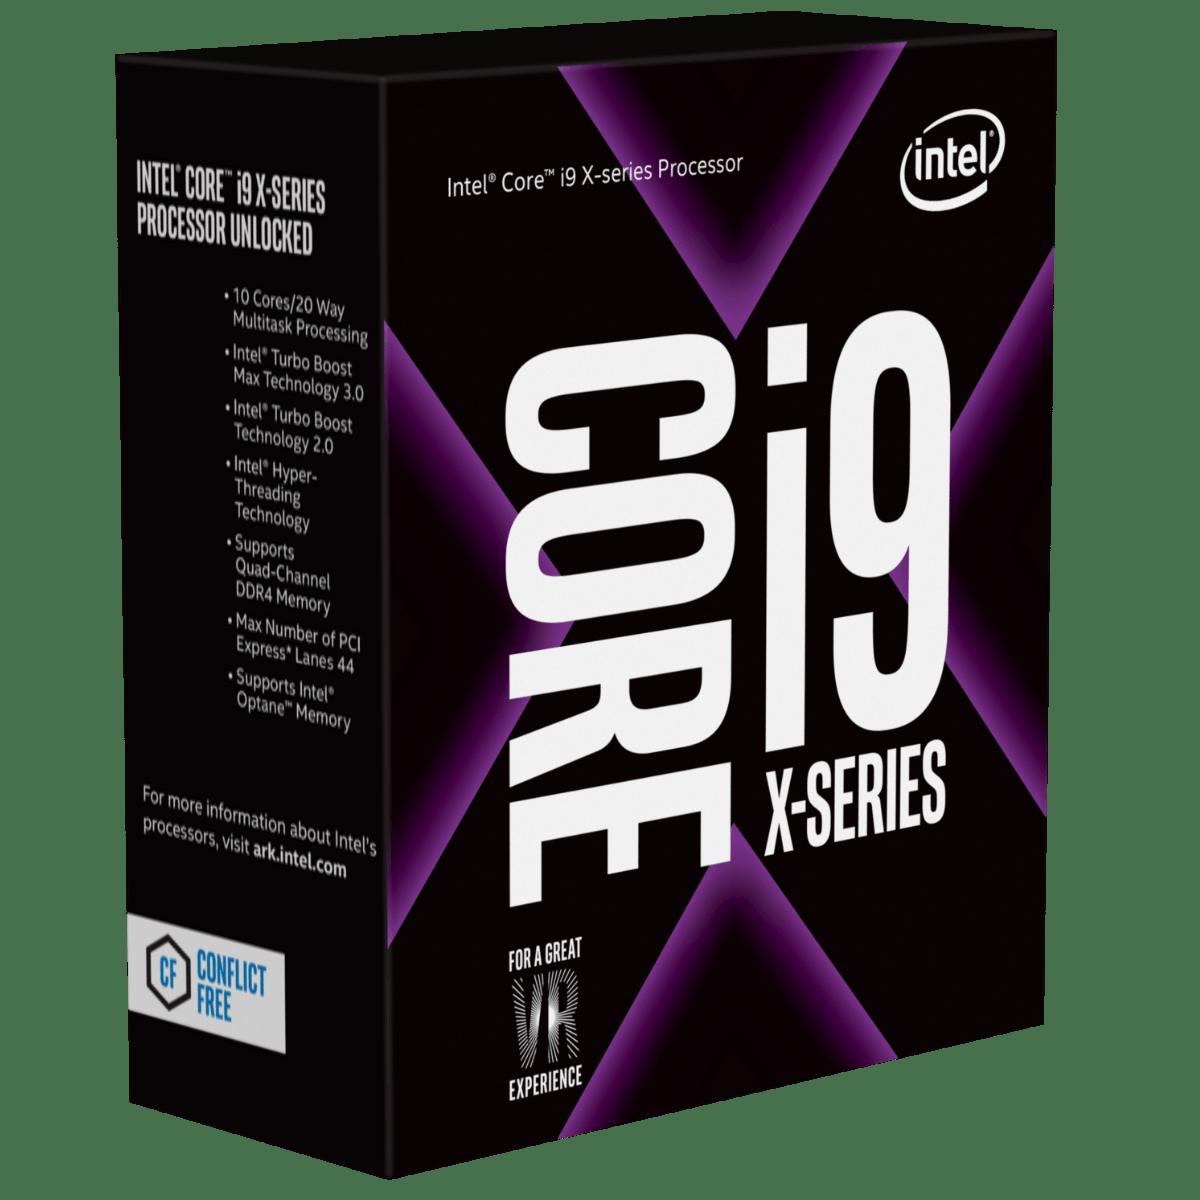 Intel – Intel Core I9-7900X CPU, 2066, 3.30GHz (4.3 Turbo), 10-Core, 140W, 13.75MB Cache, Overclockable